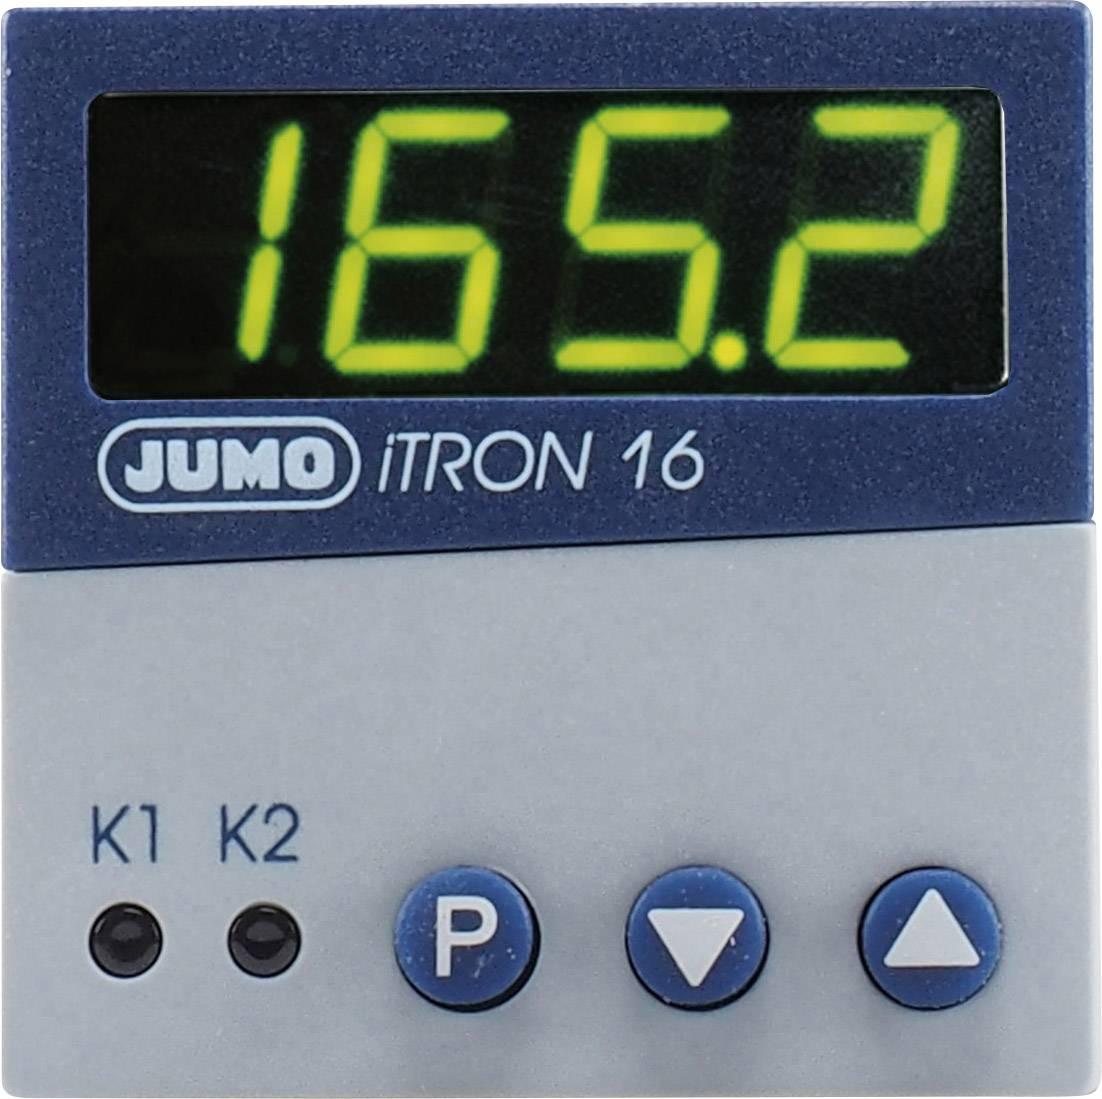 Regulátor mikroprocesoru JUMO iTRON 16, 110 - 240 V/AC